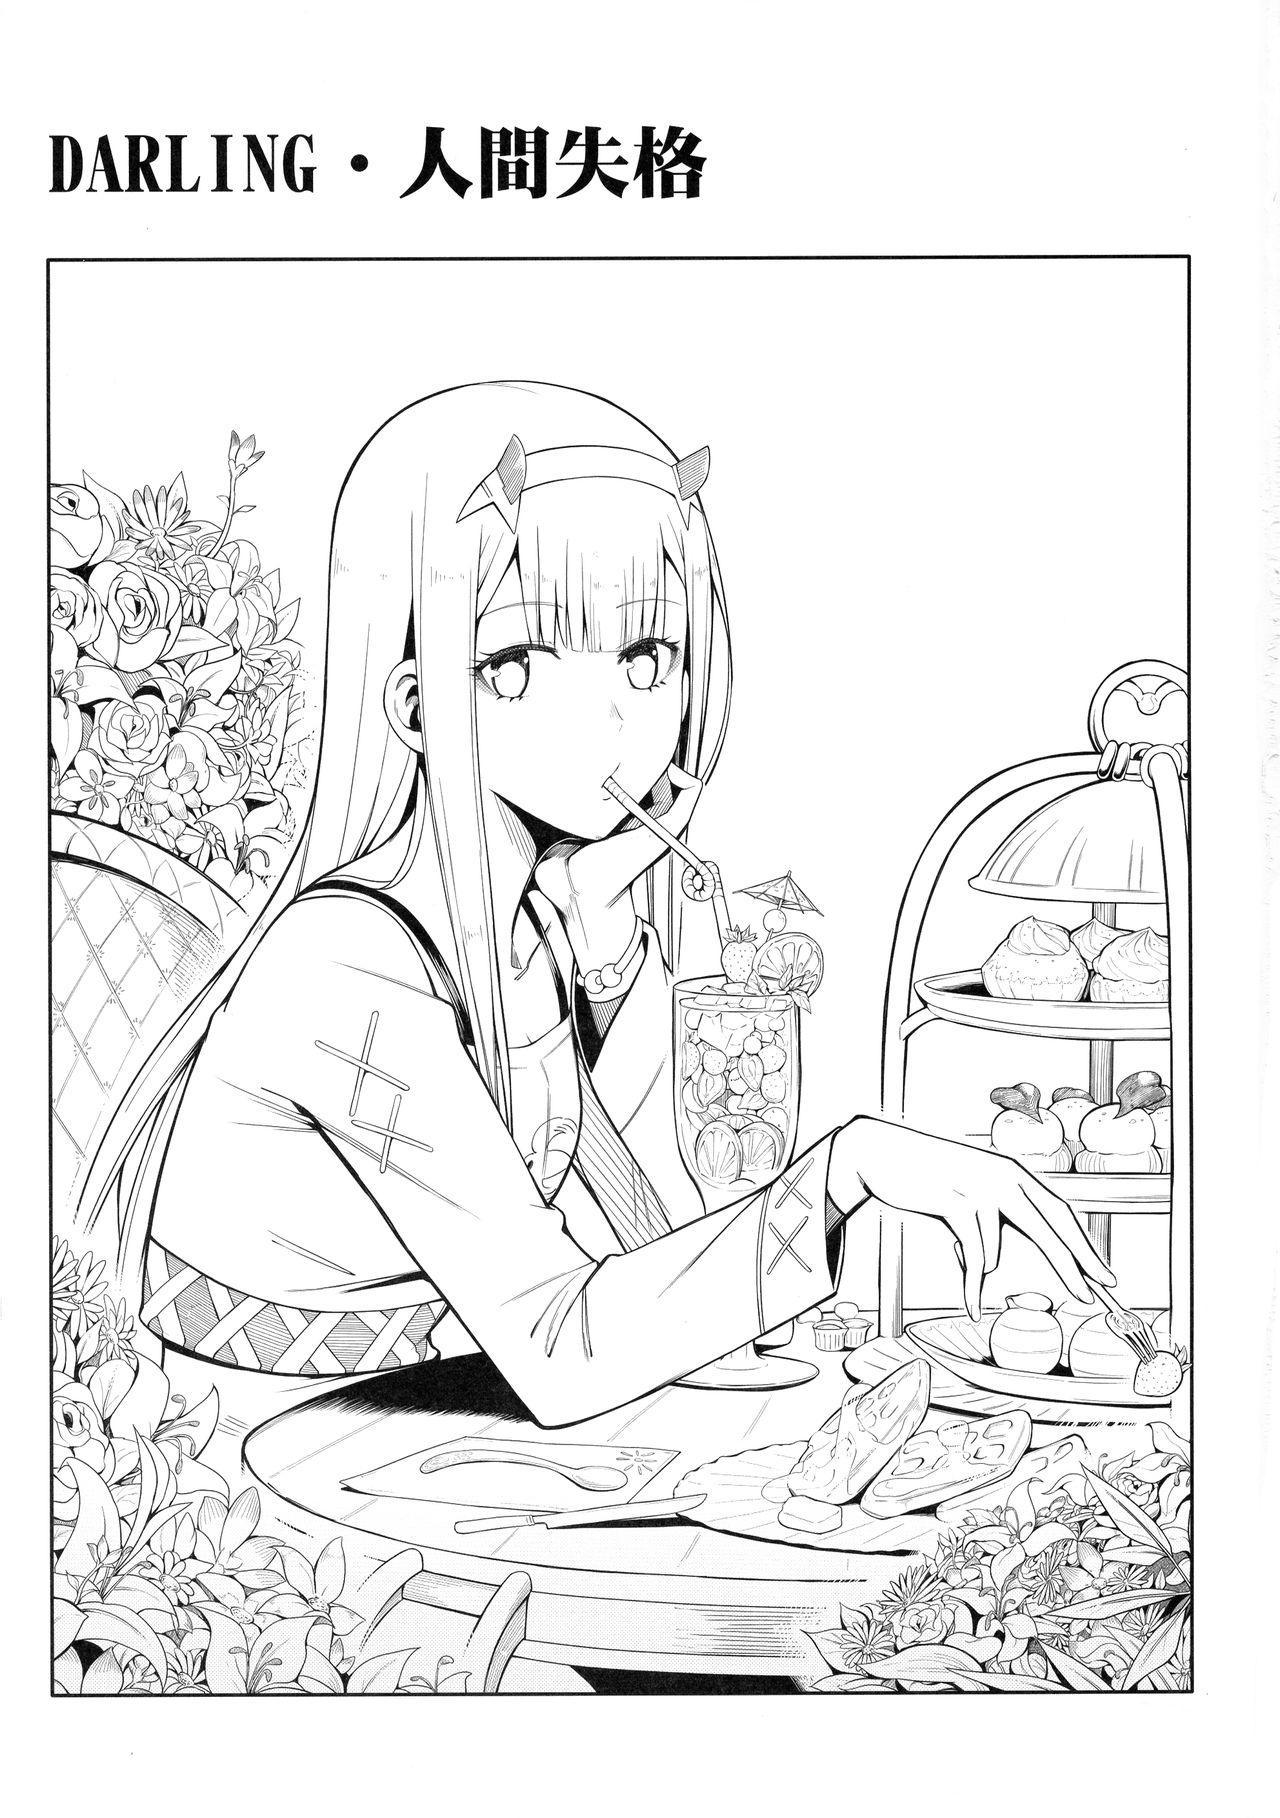 DARLING Ningen Shikkaku 1